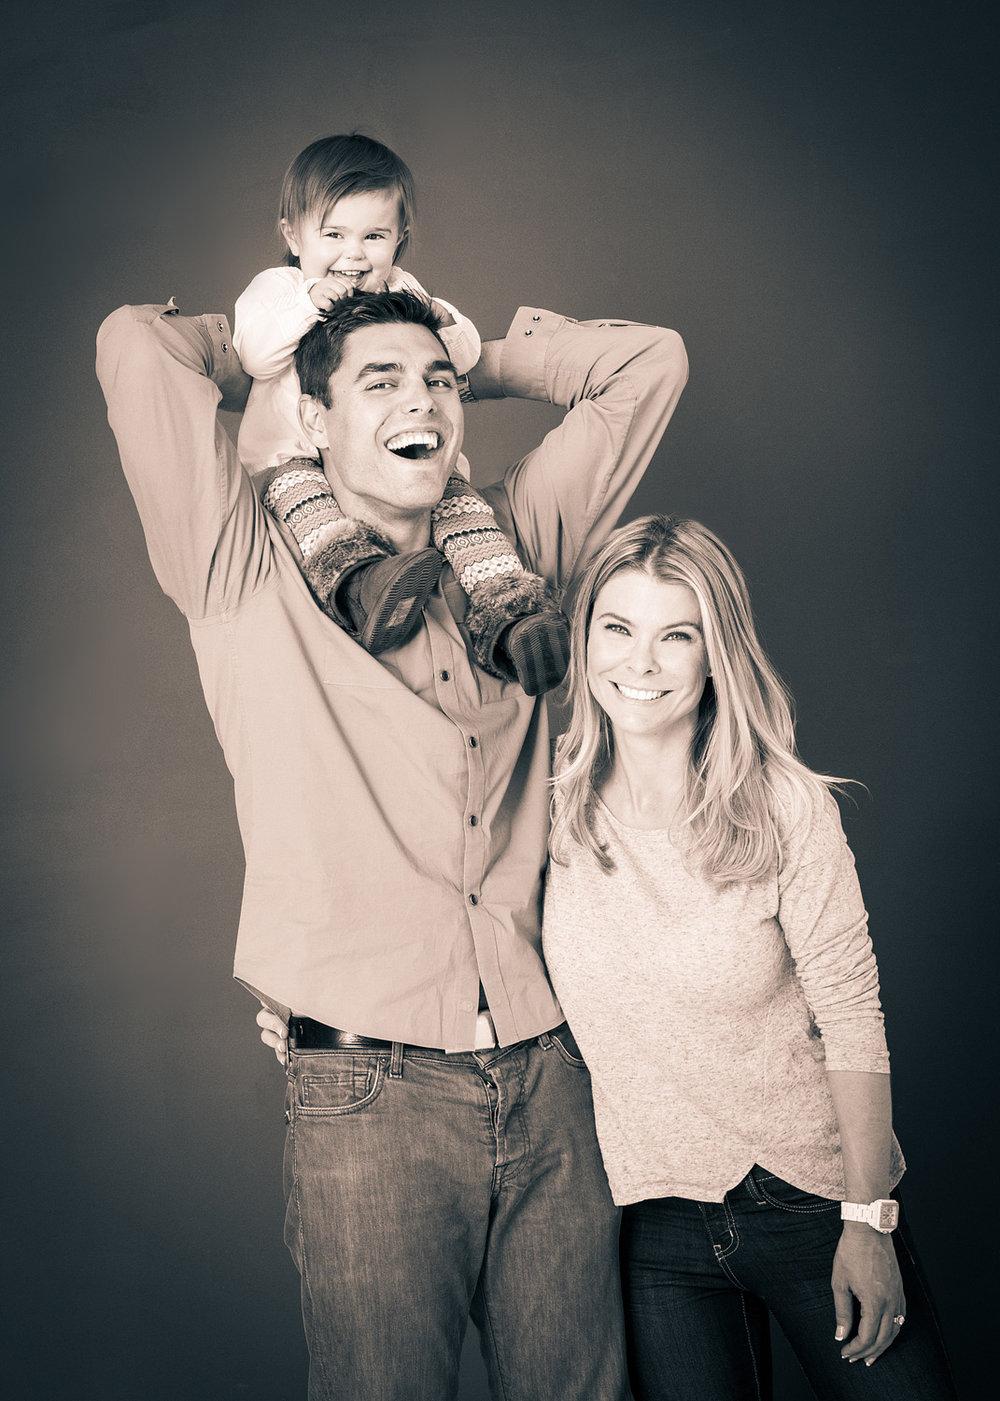 fun-family-photograph-kids-denver-co.jpg